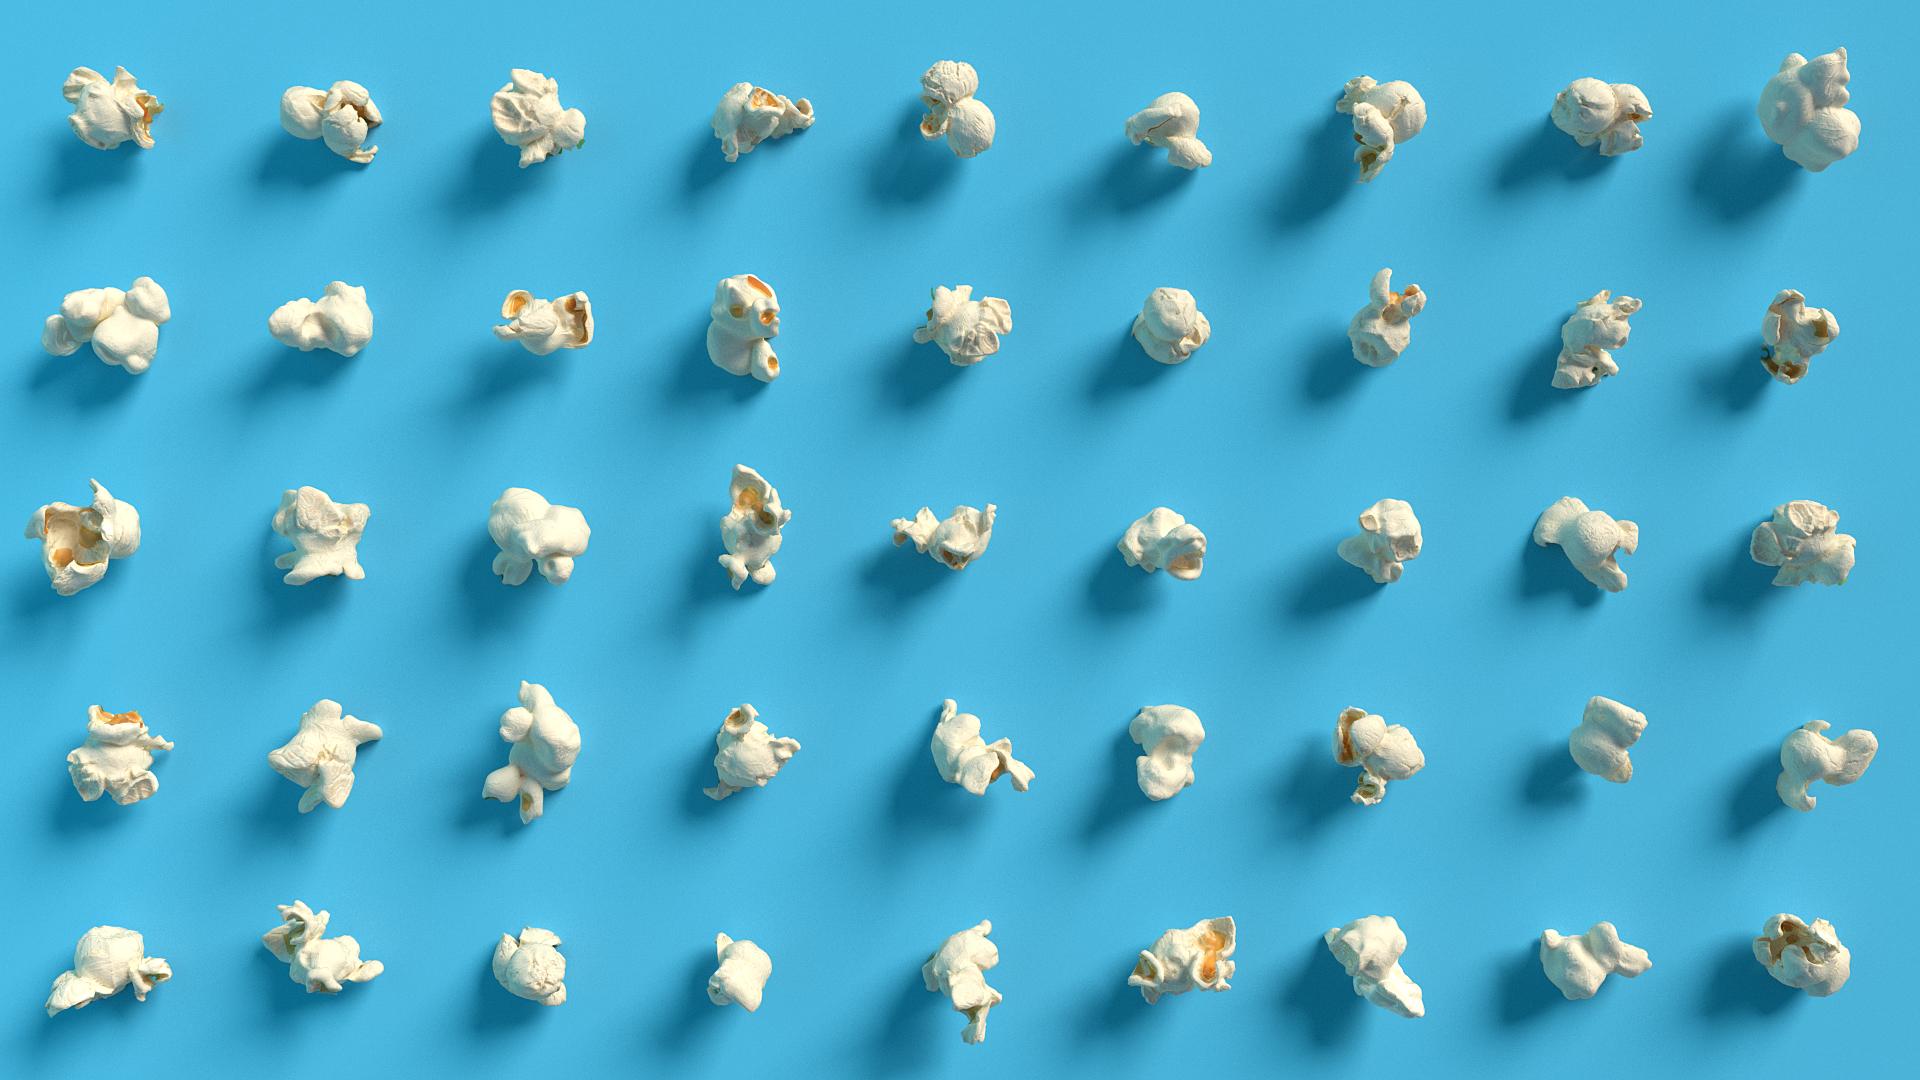 Popcorn_gridmaster_01_16x9_0080 (0-00-00-00)